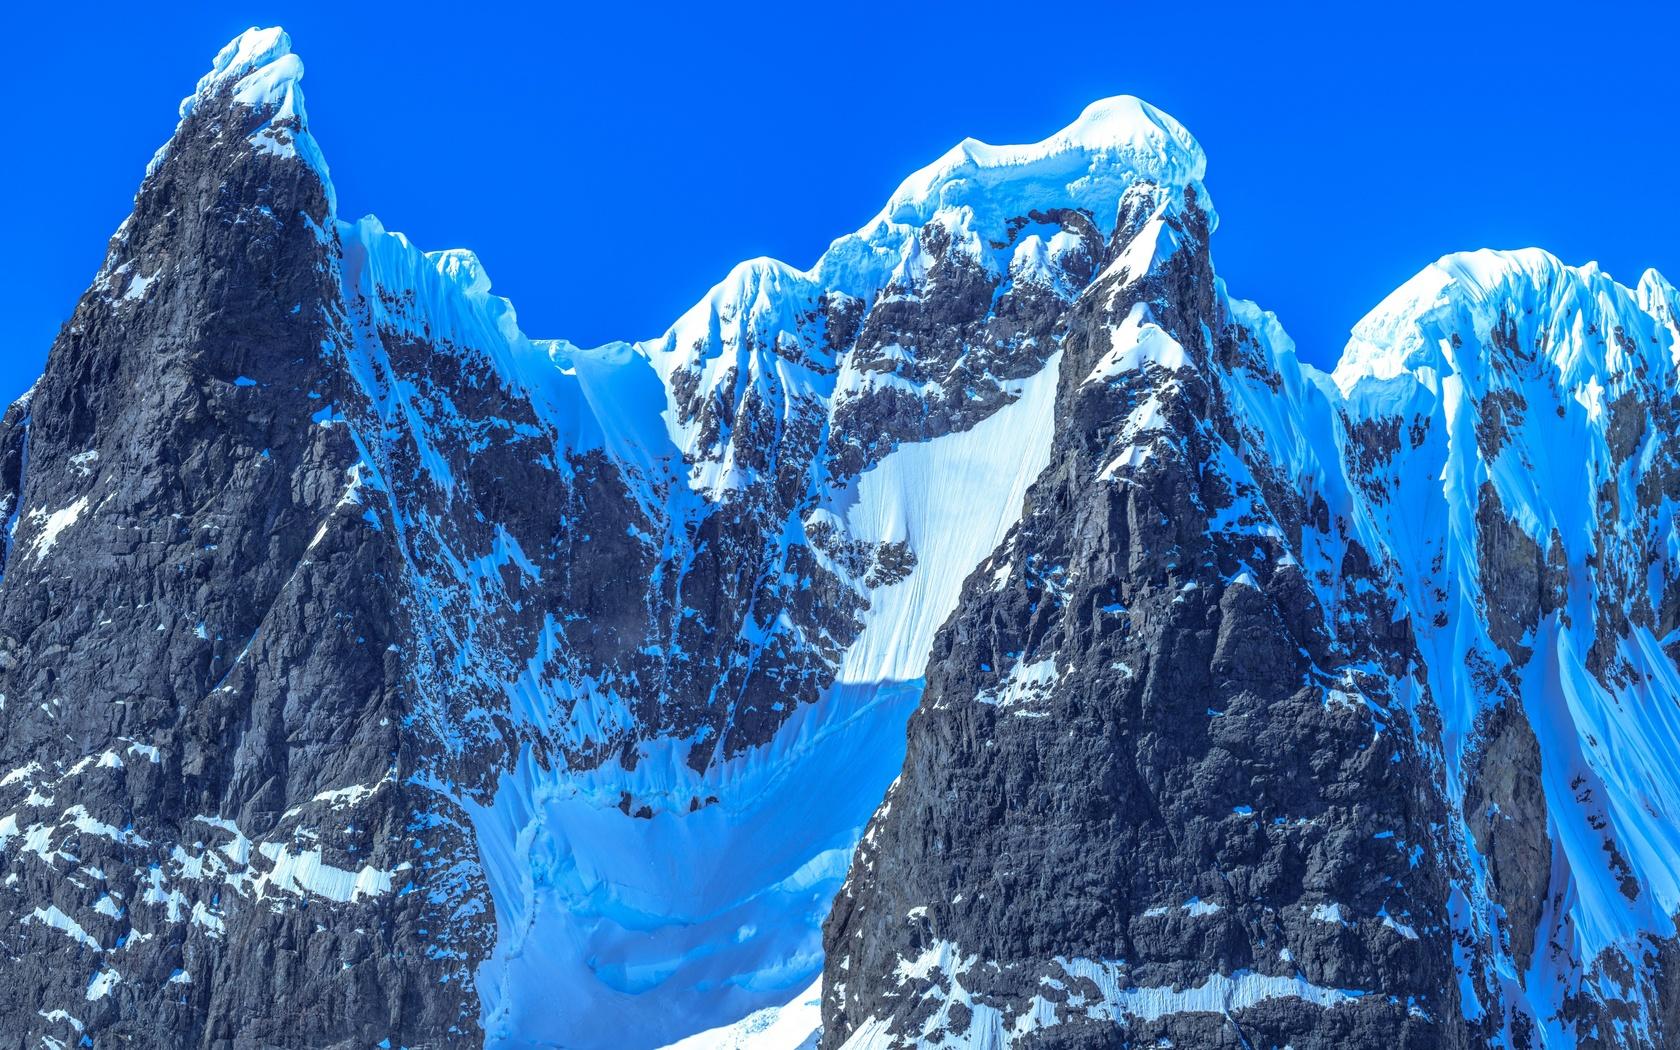 гора, вершина, заснеженный, антарктида